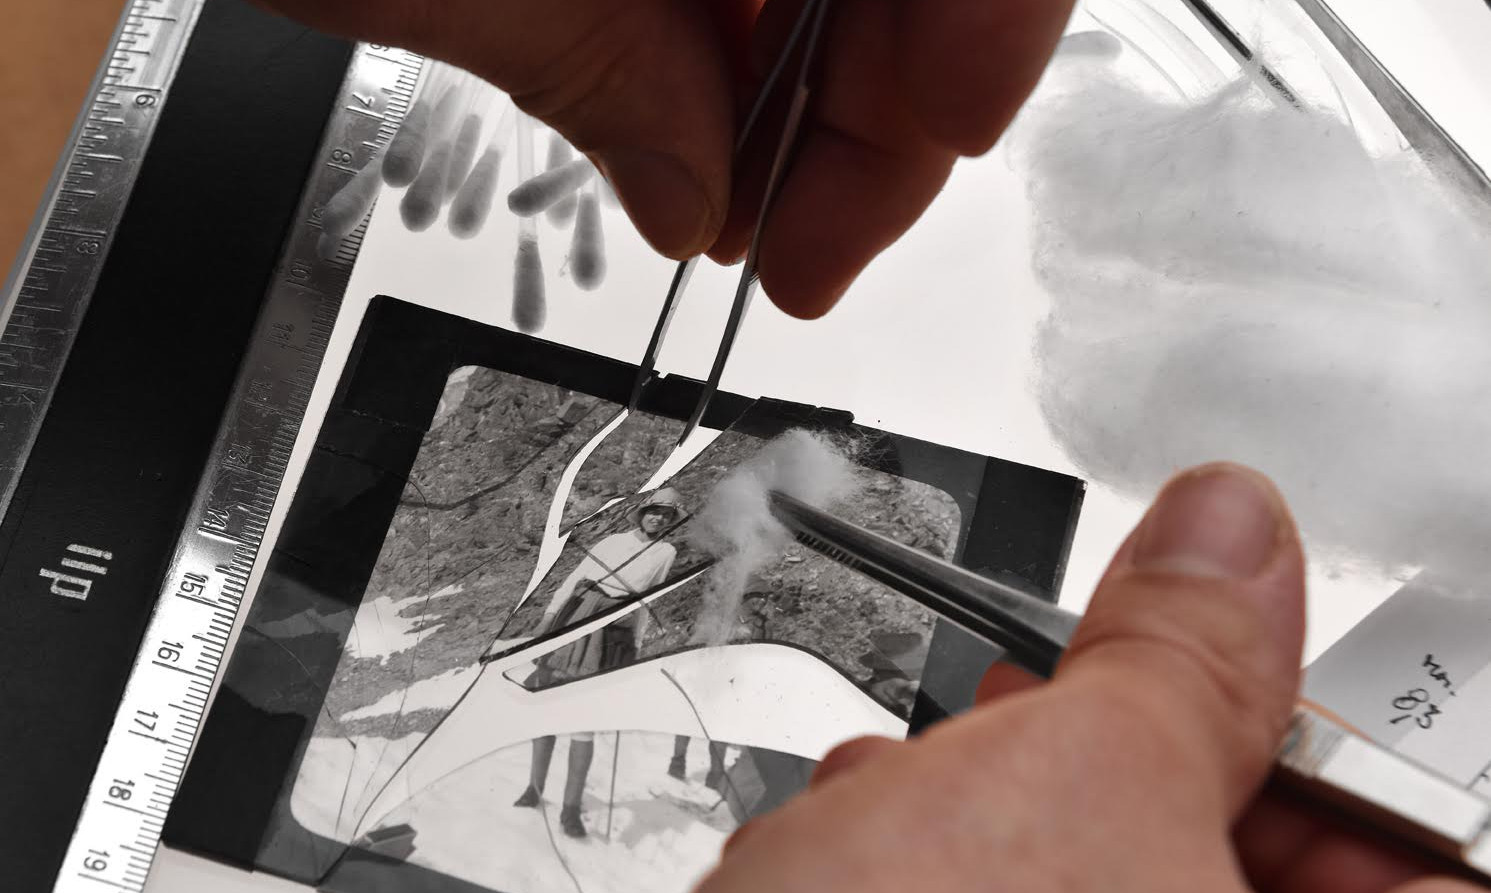 Handmade restoration of exceptional photo negatives